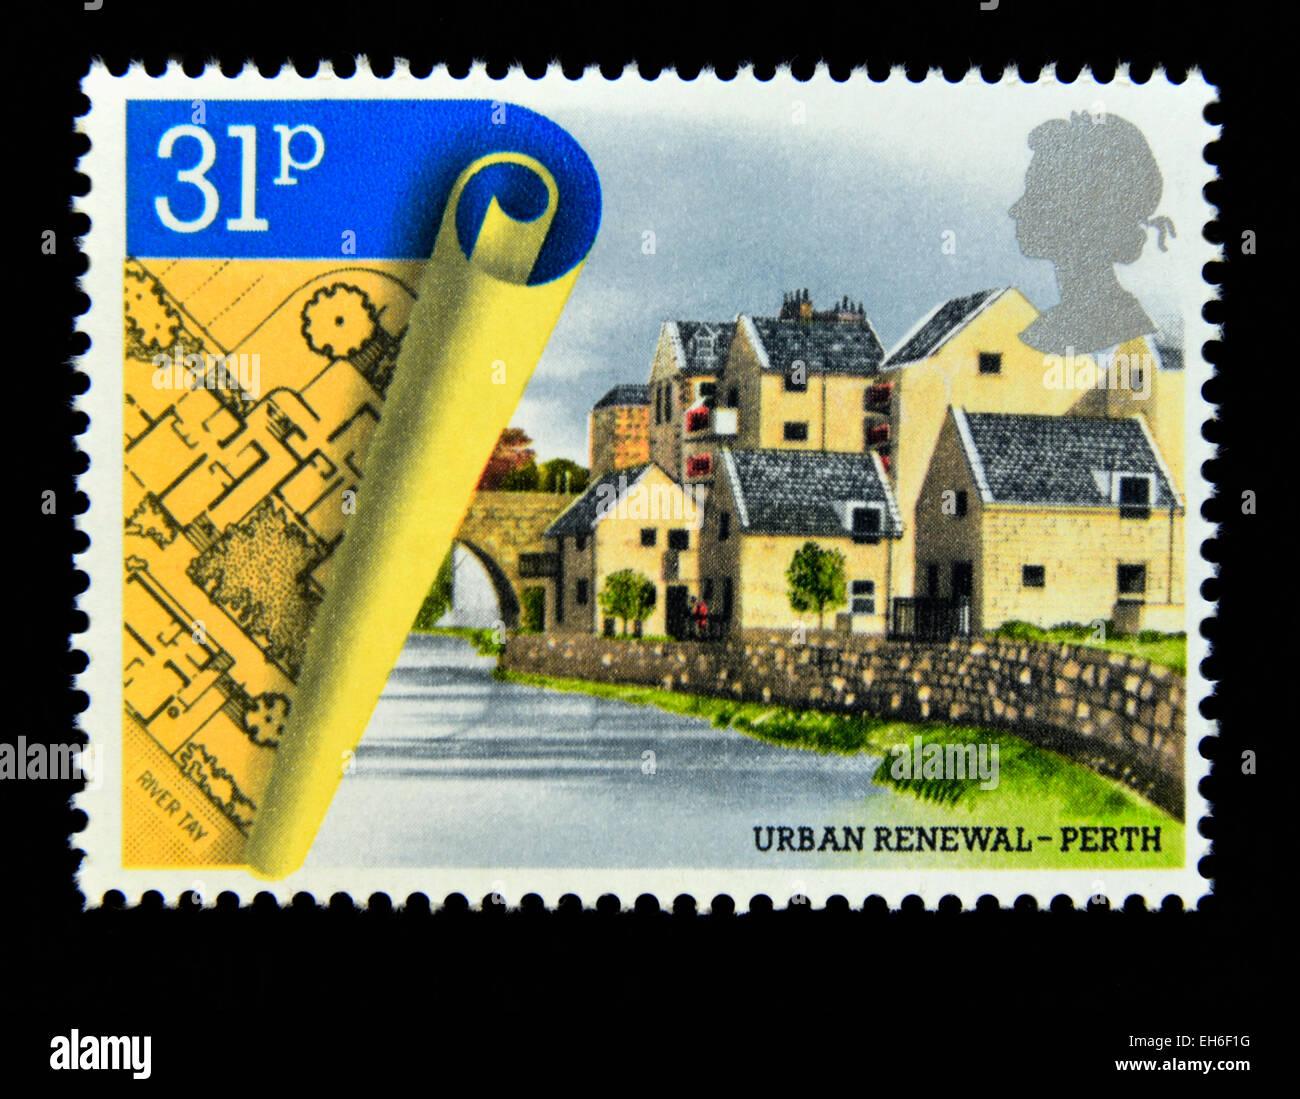 Postage stamp. Great Britain. Queen Elizabeth II. 1984. Urban Renewal. Commercial Street Development, Perth. 31p. - Stock Image